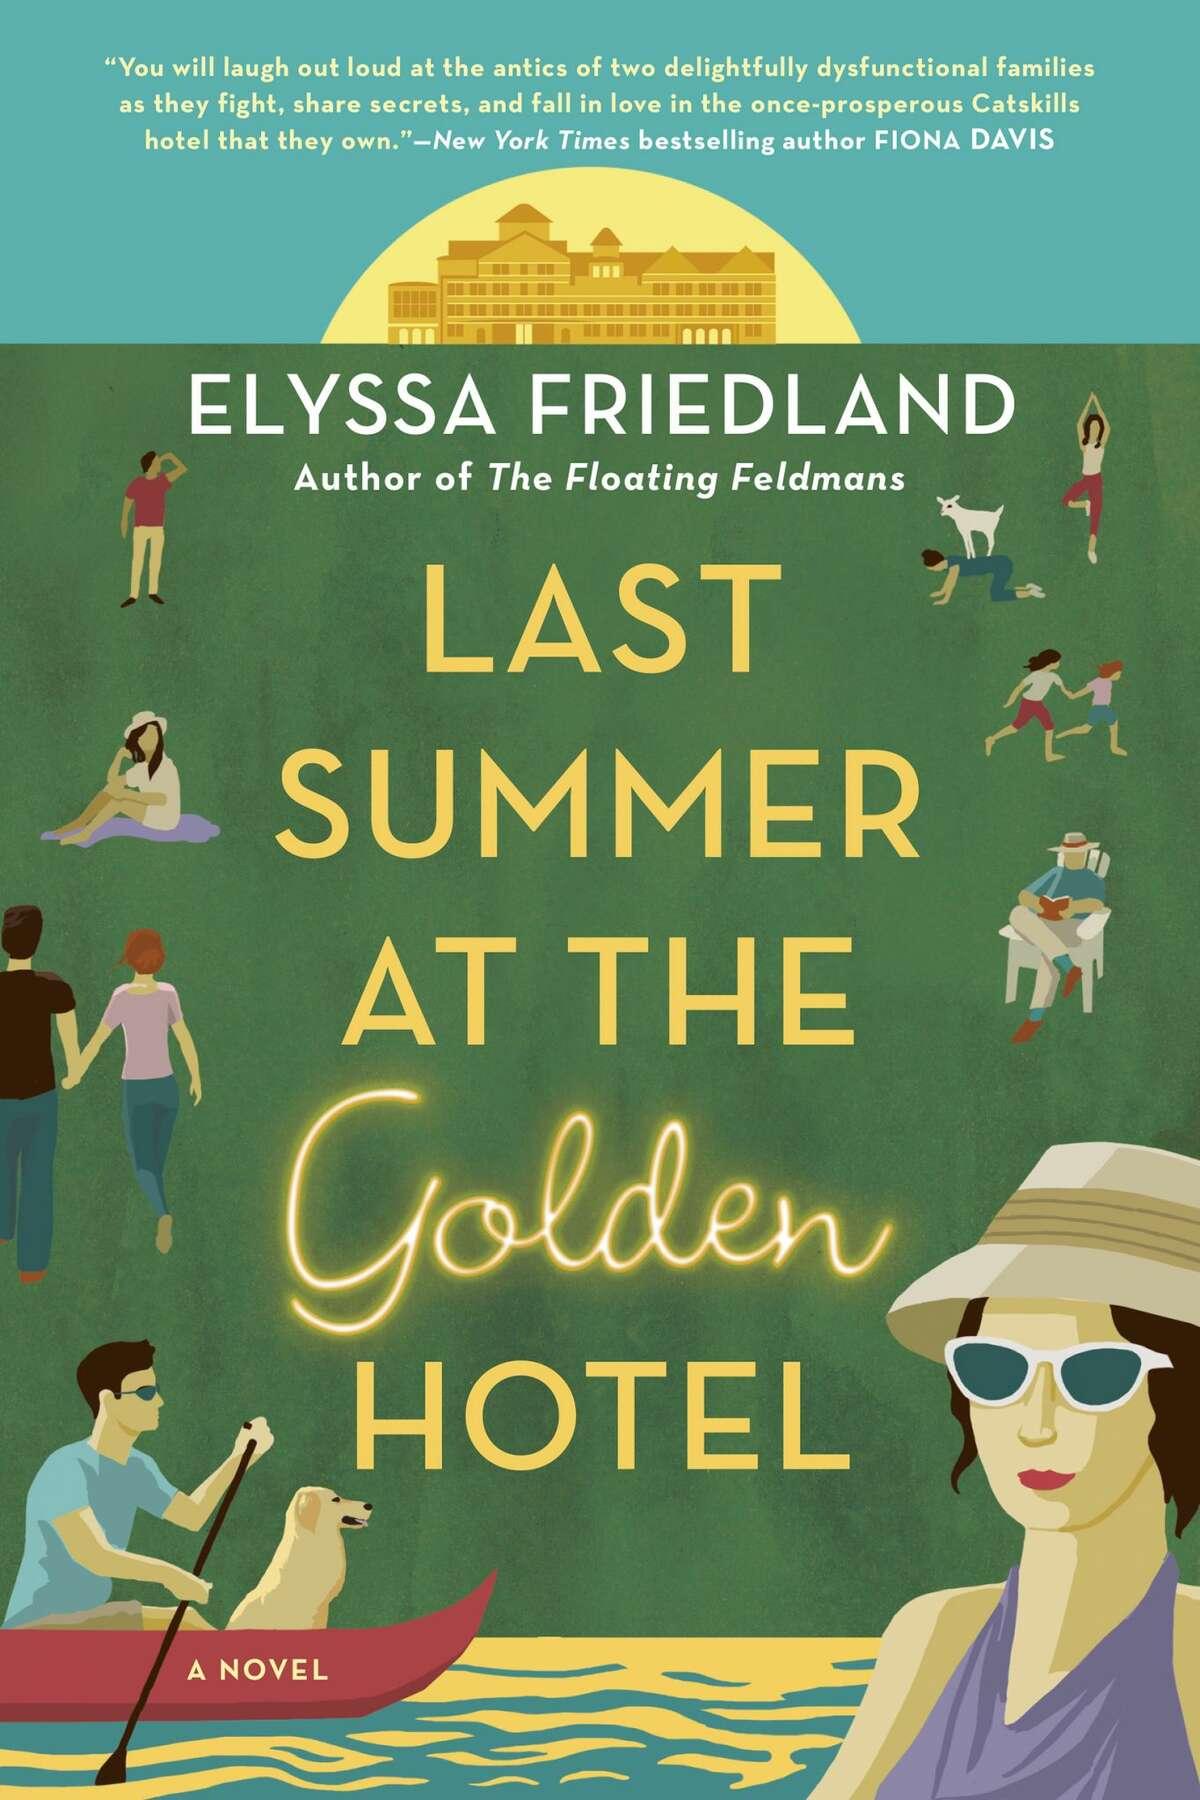 """Last Summer at the Golden Hotel"" is Elyssa Friedland's latest novel."